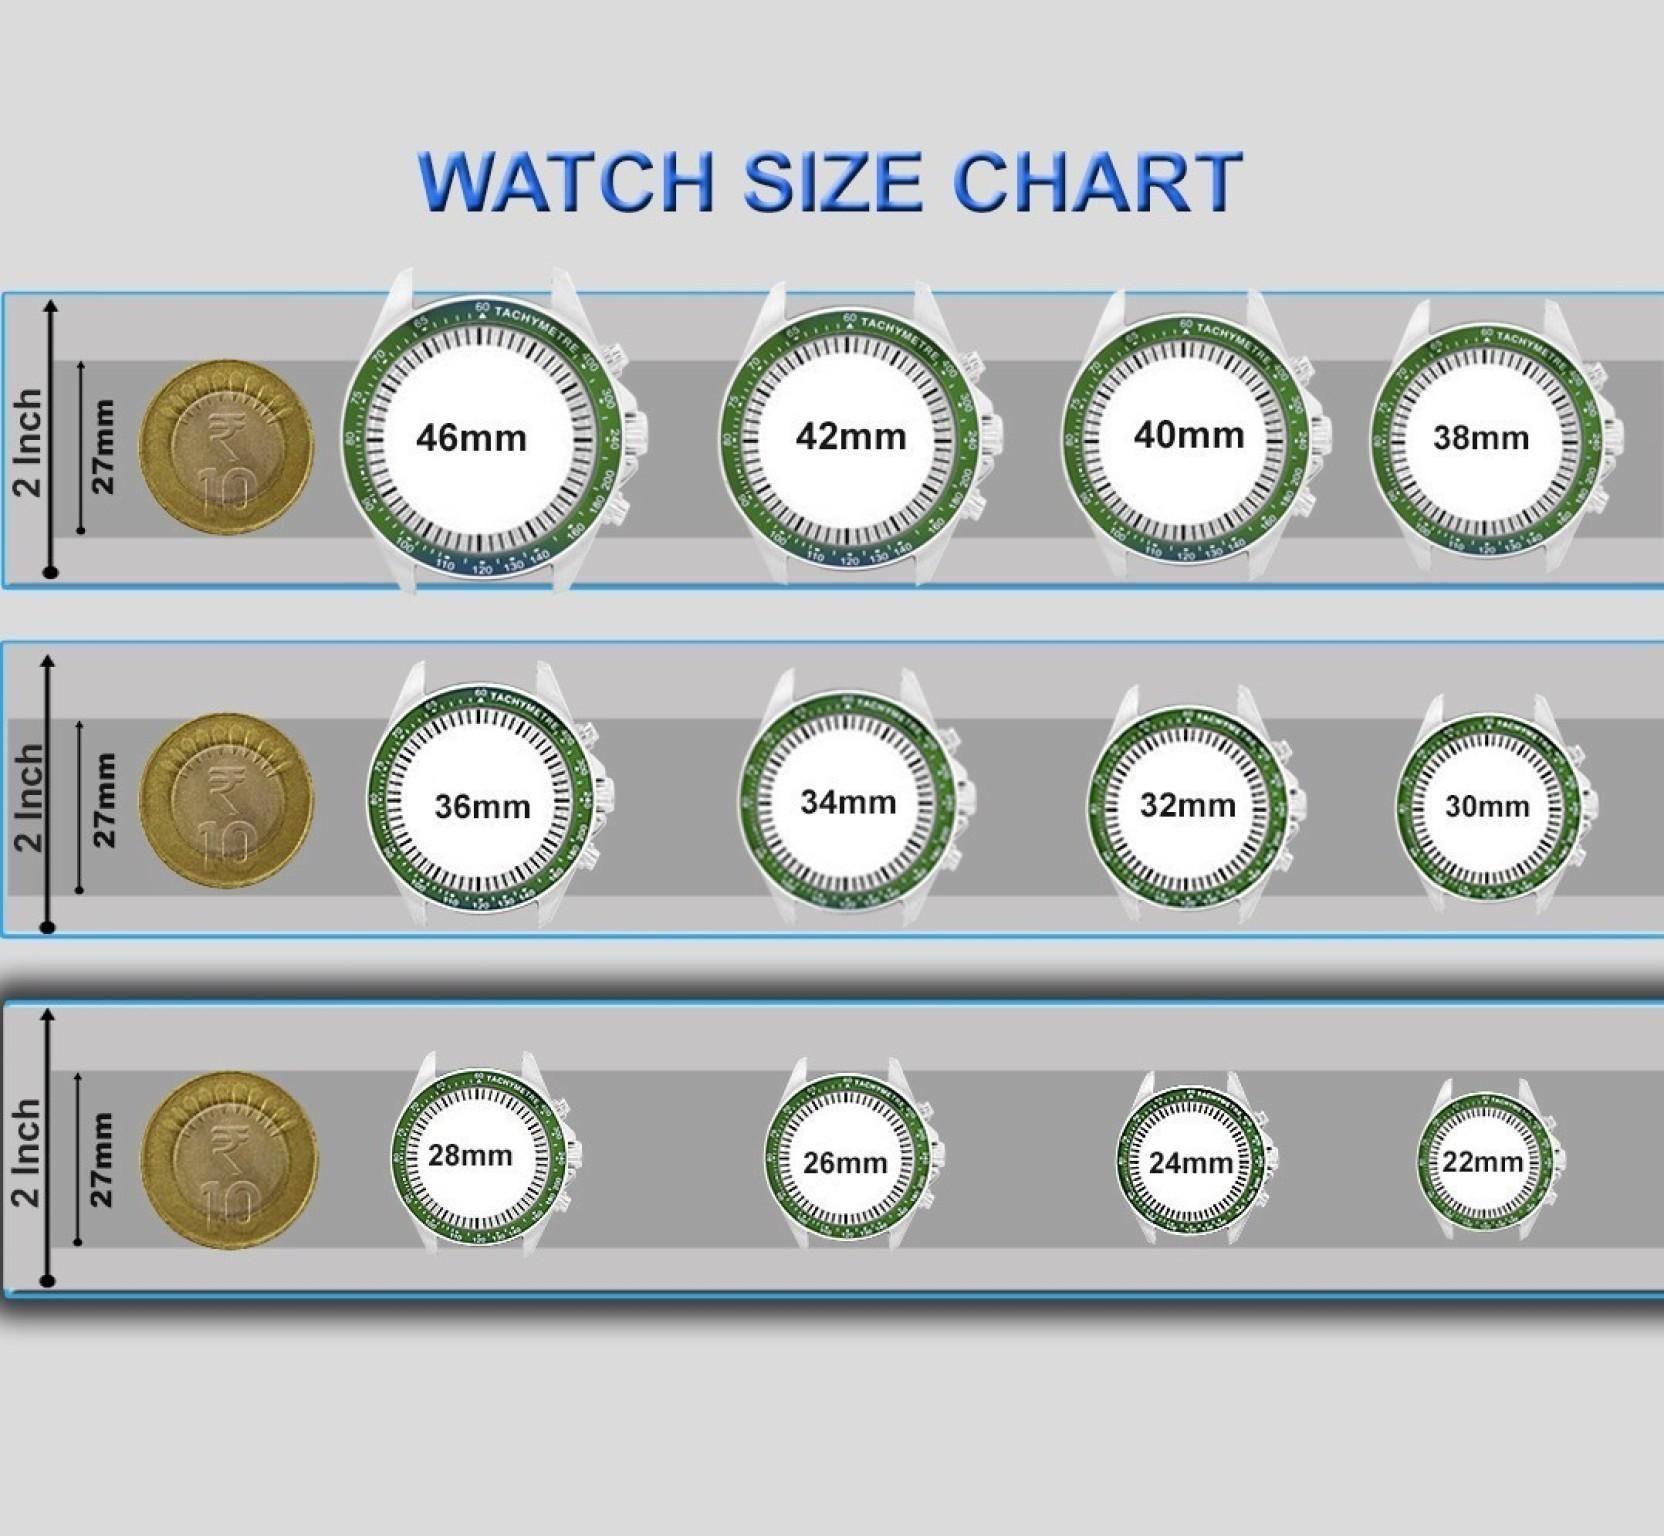 Curren 8023 Watch - For Men